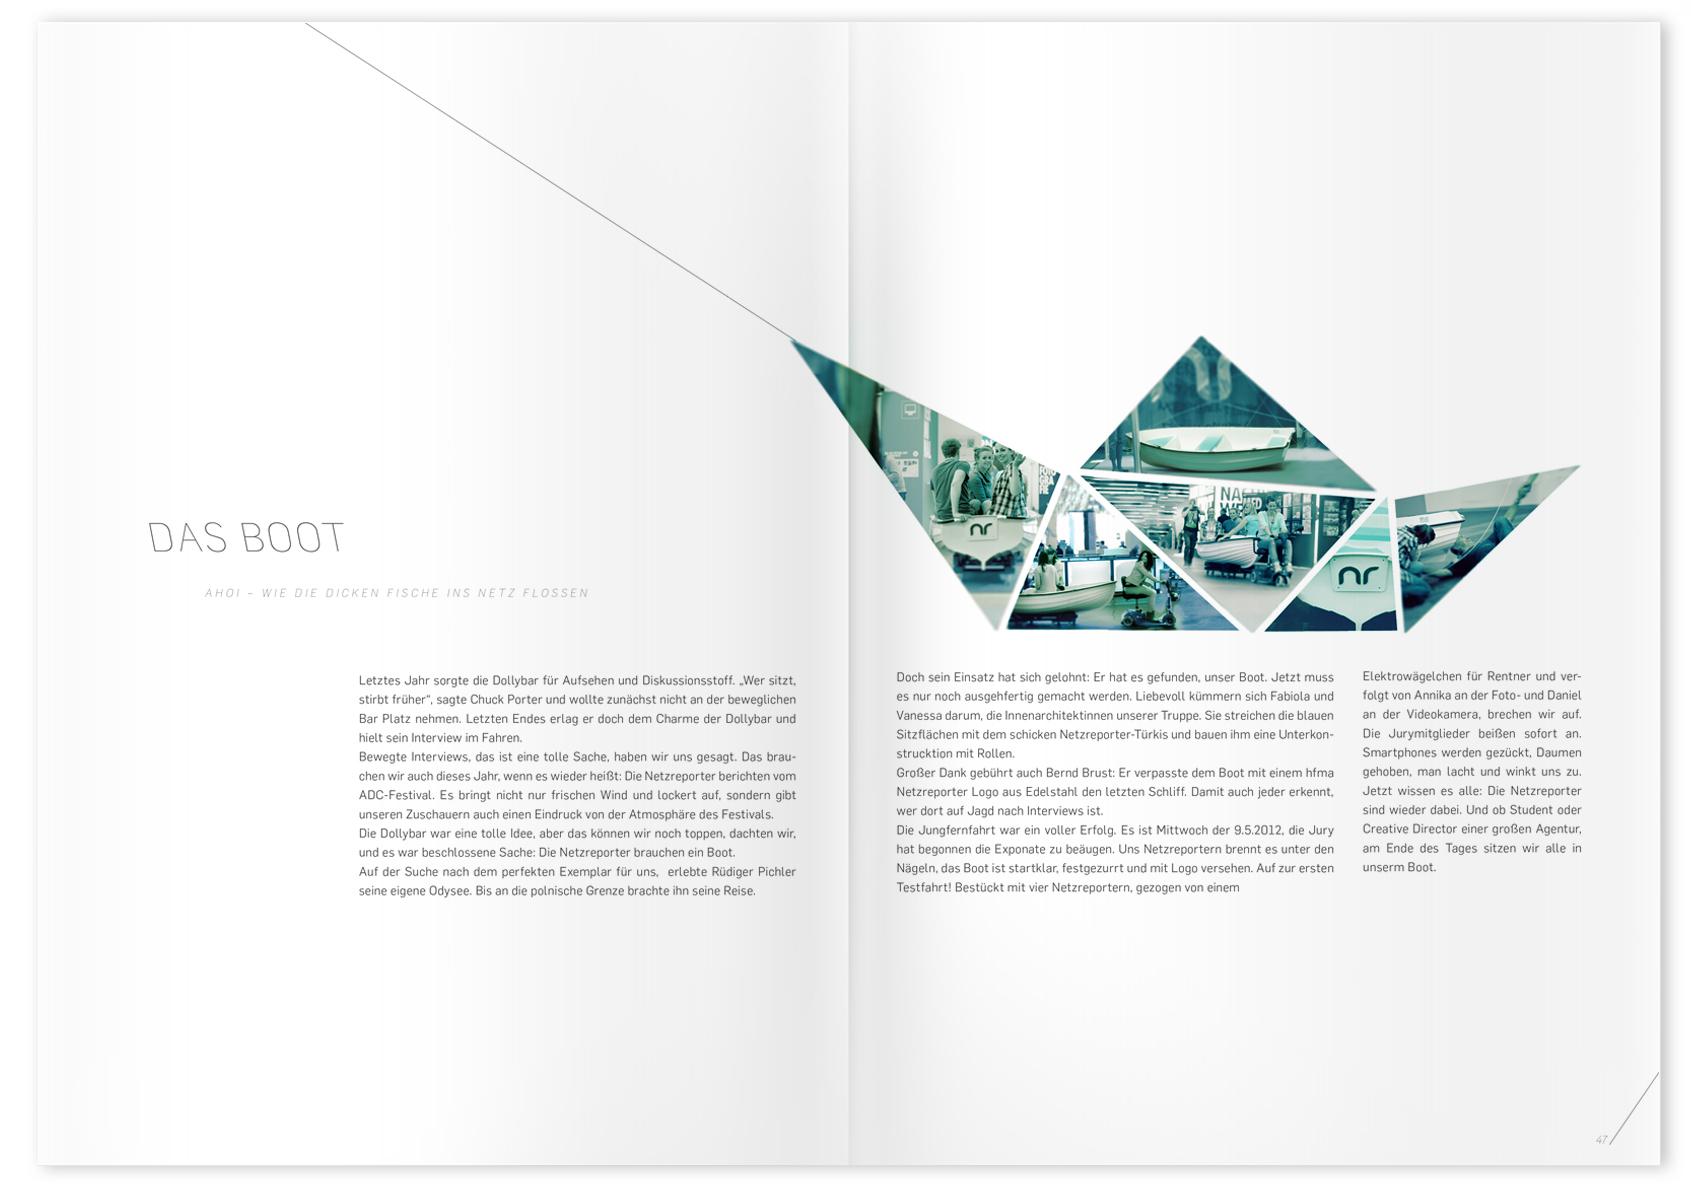 06_hFMA Netzreporter_ADC Festival_Editorial Design_Grafikdesign_Gloria Kison.jpg